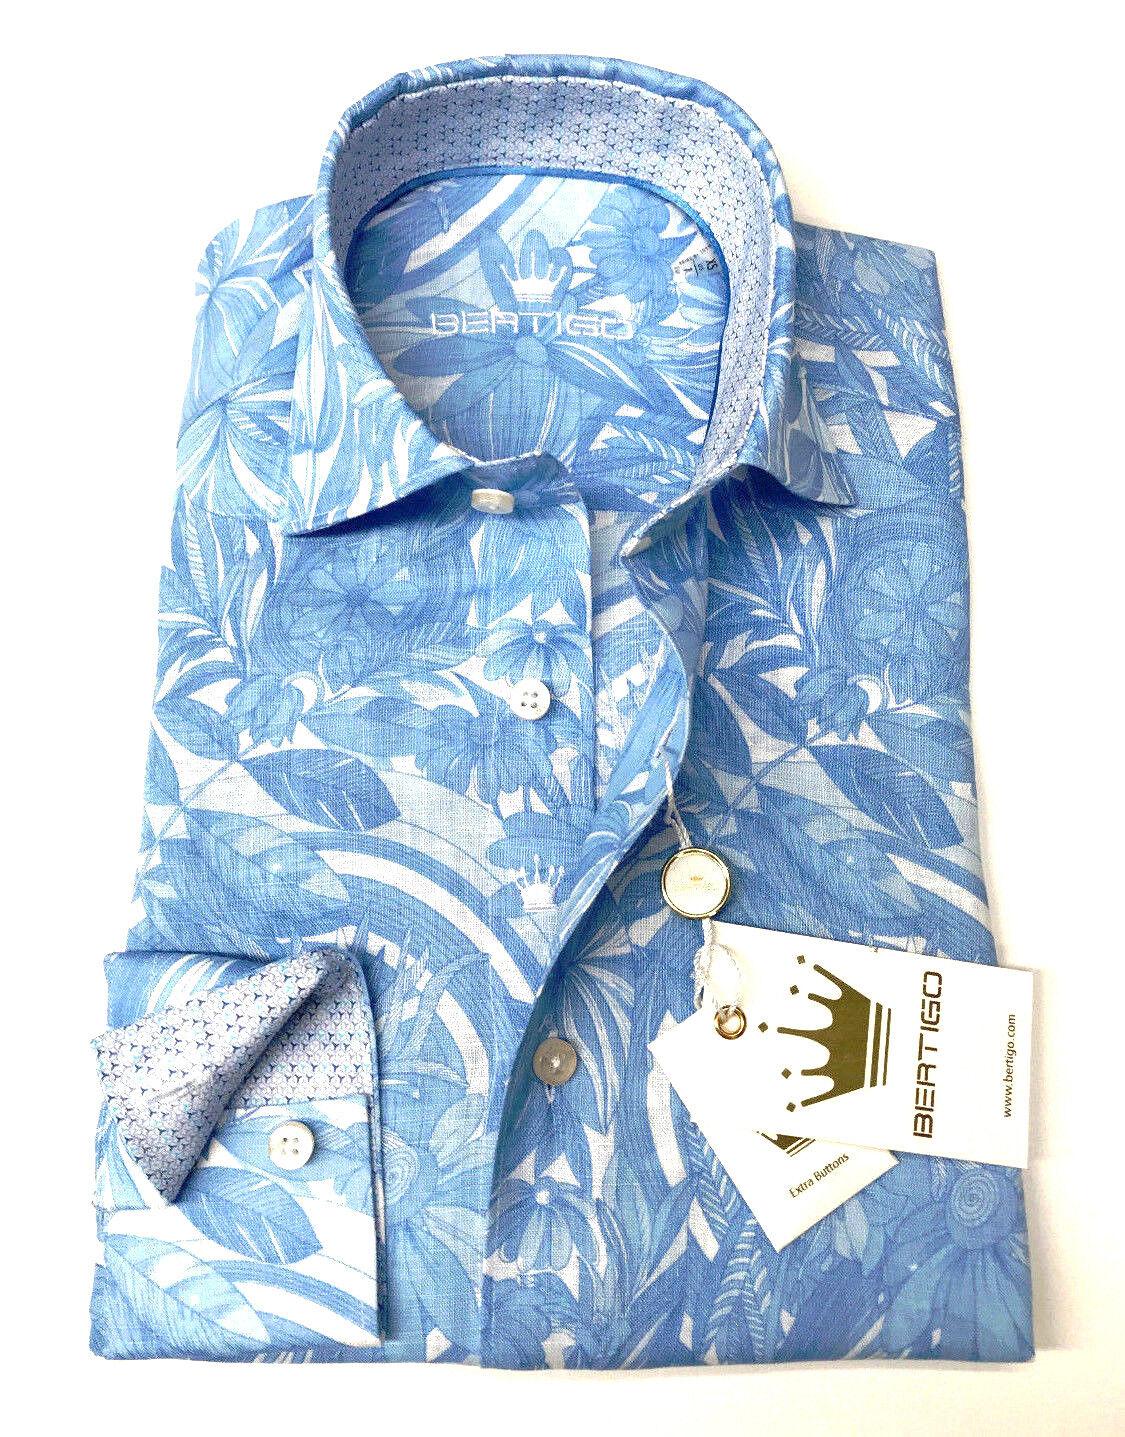 BERTIGO dress shirt LUIZ - 02 ( Weiß LABEL ) 2018 COLLECTION WAS  169